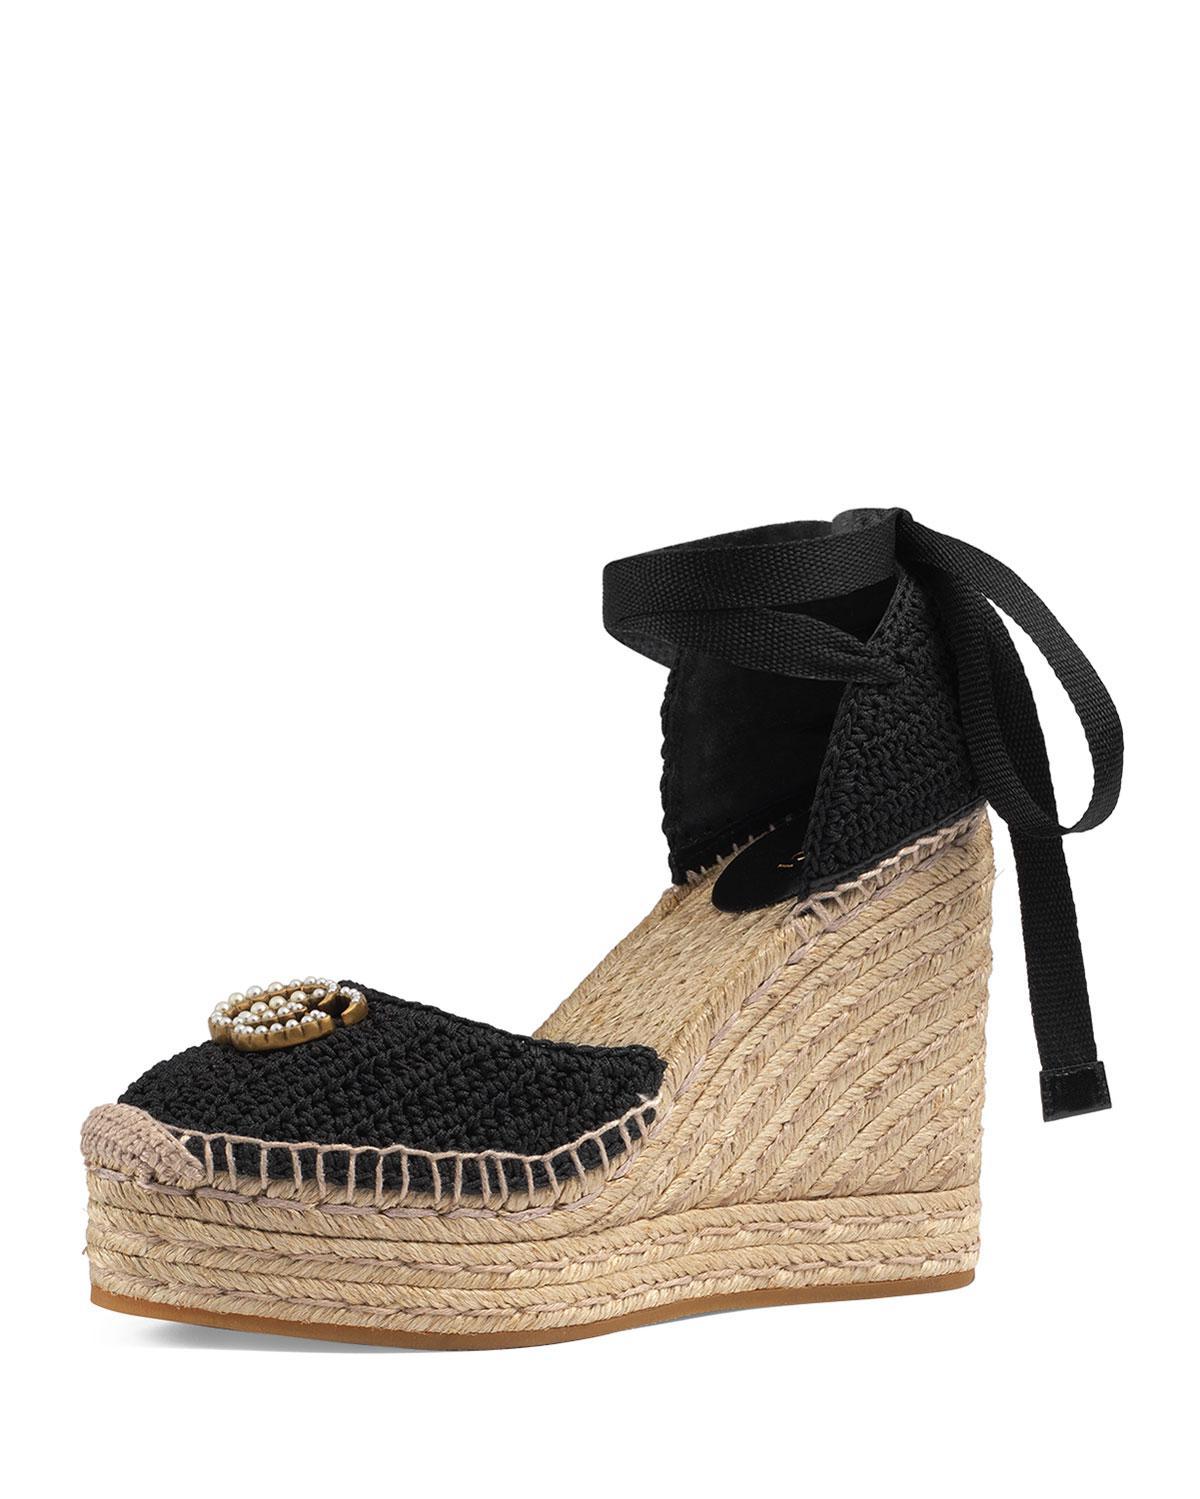 7abfe8f49617 Gucci. Women s Black Lilibeth Logo-embellished Crocheted Cotton Wedge  Espadrilles